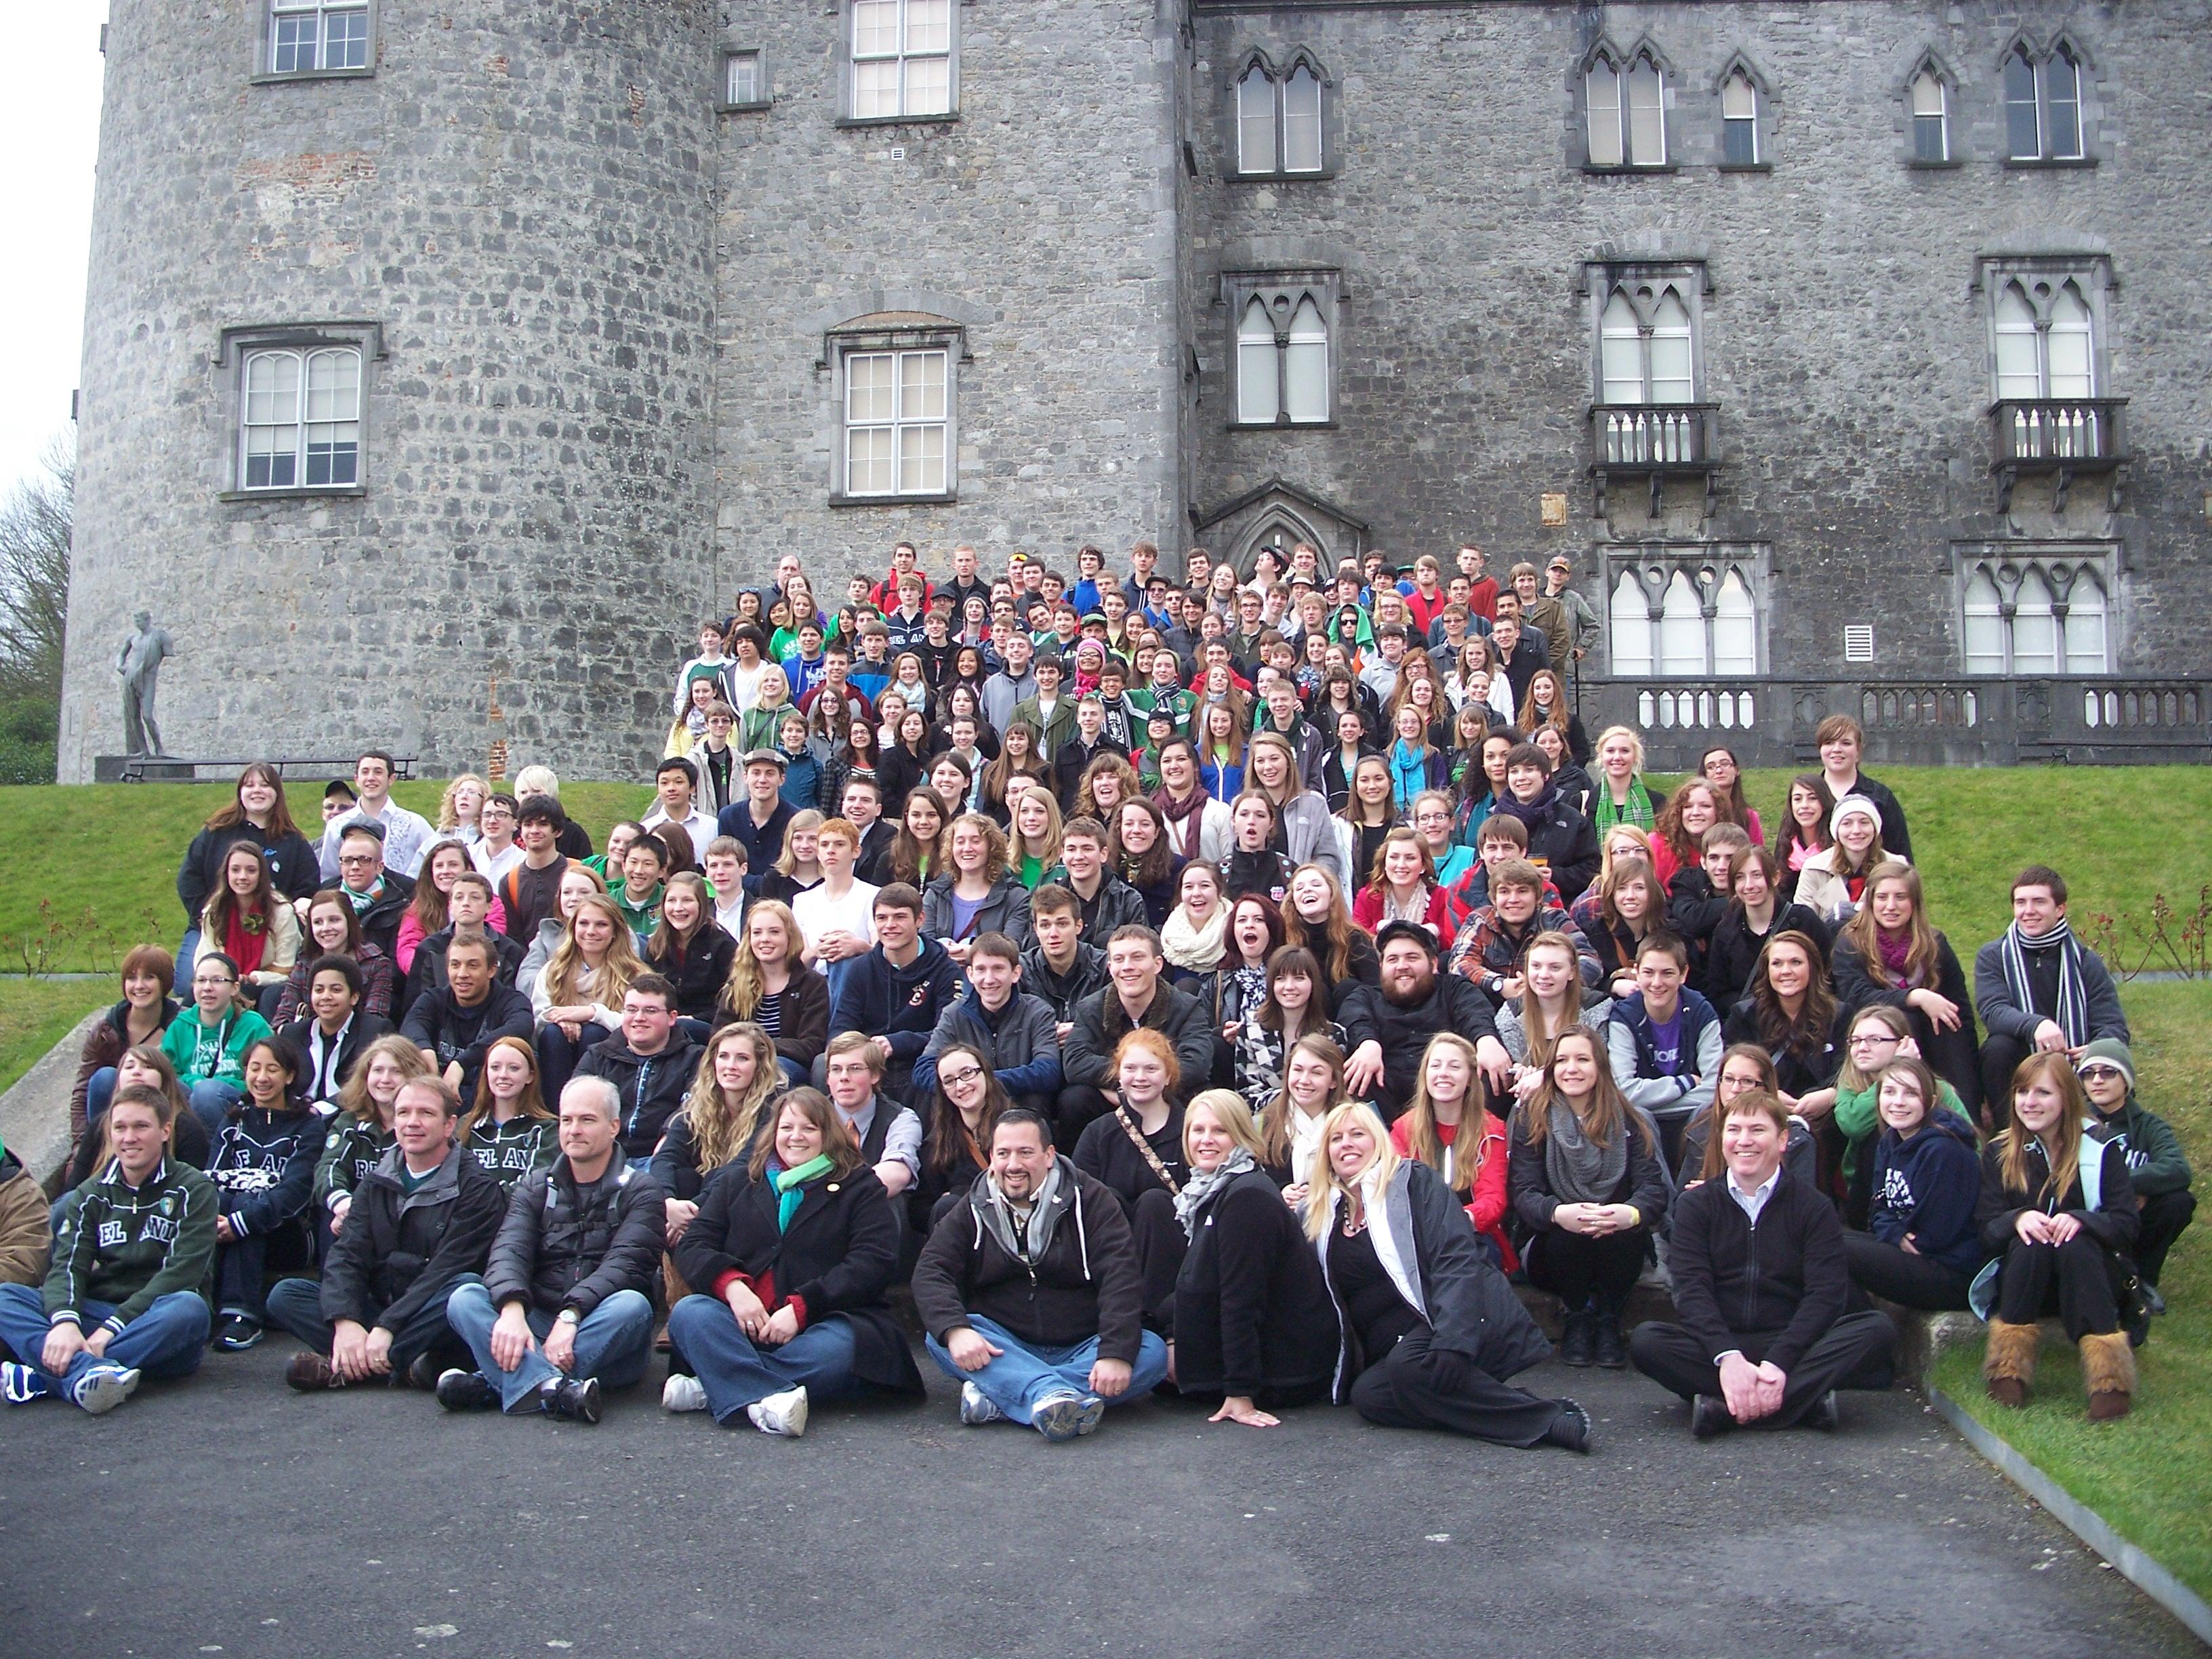 Bartlesville+musicians Kilkenny